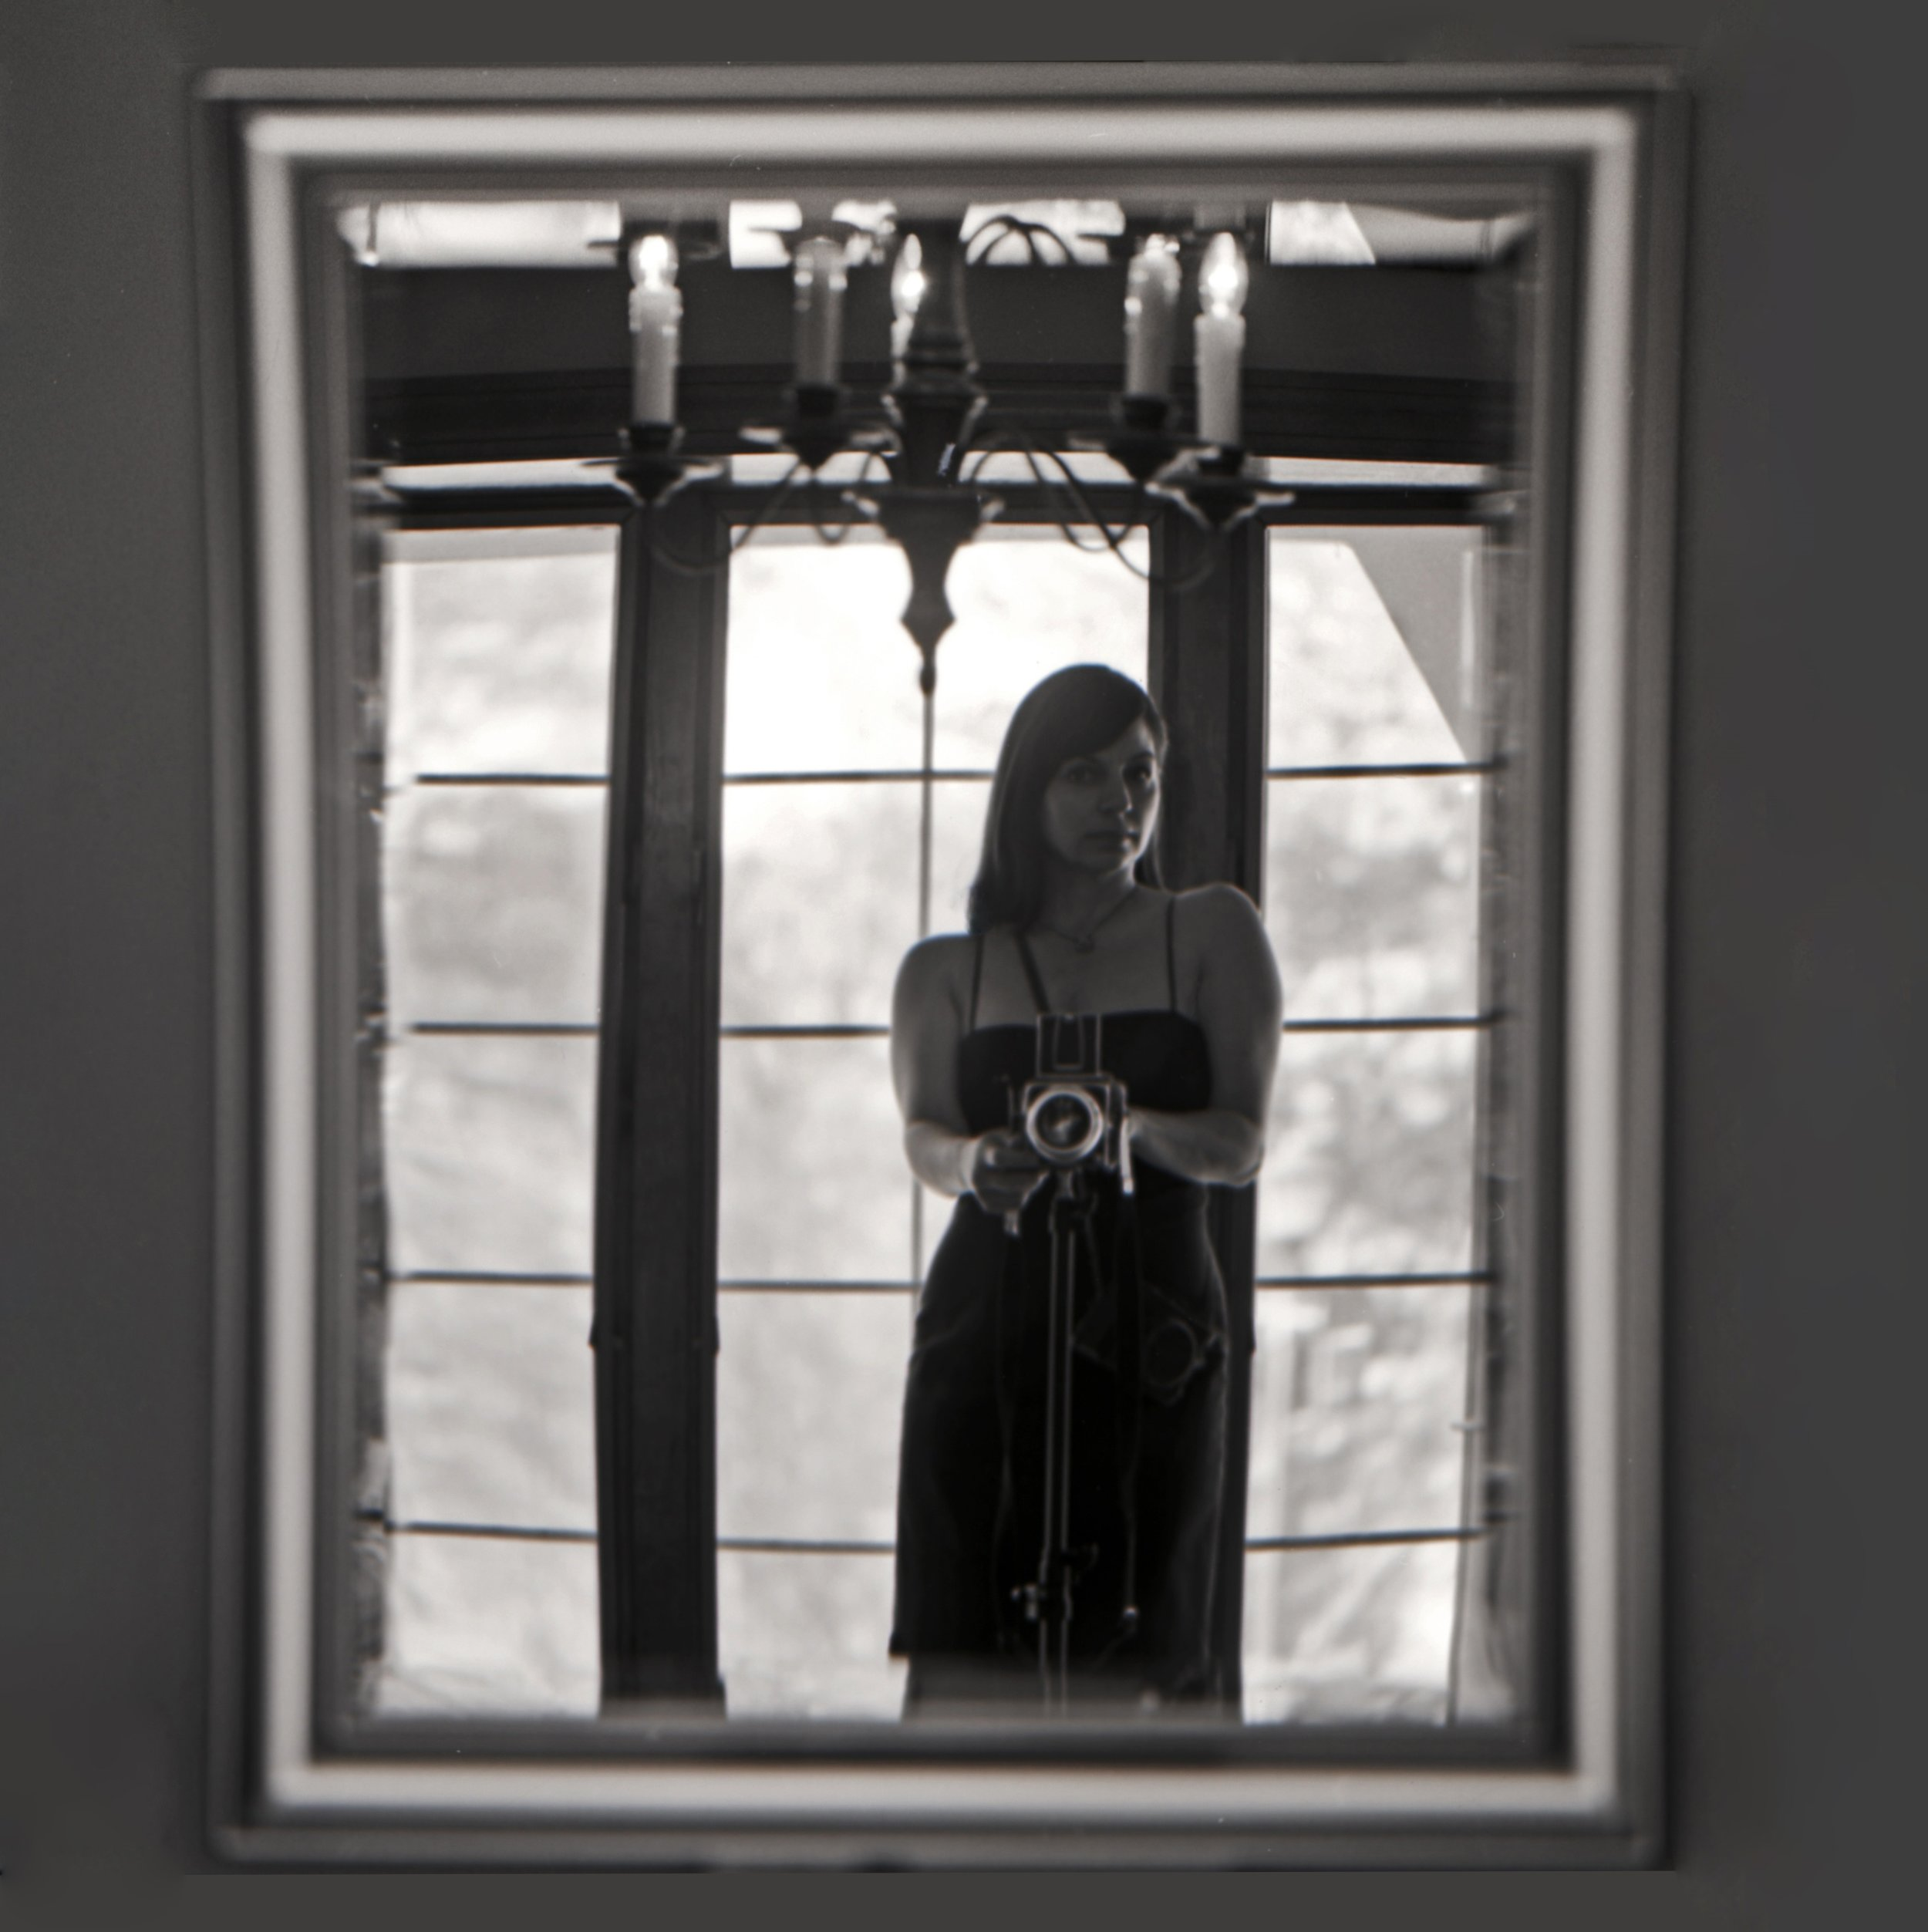 Ellen Goodman - Reflection | Hasselblad 500 CM | Kodak T-Max 400